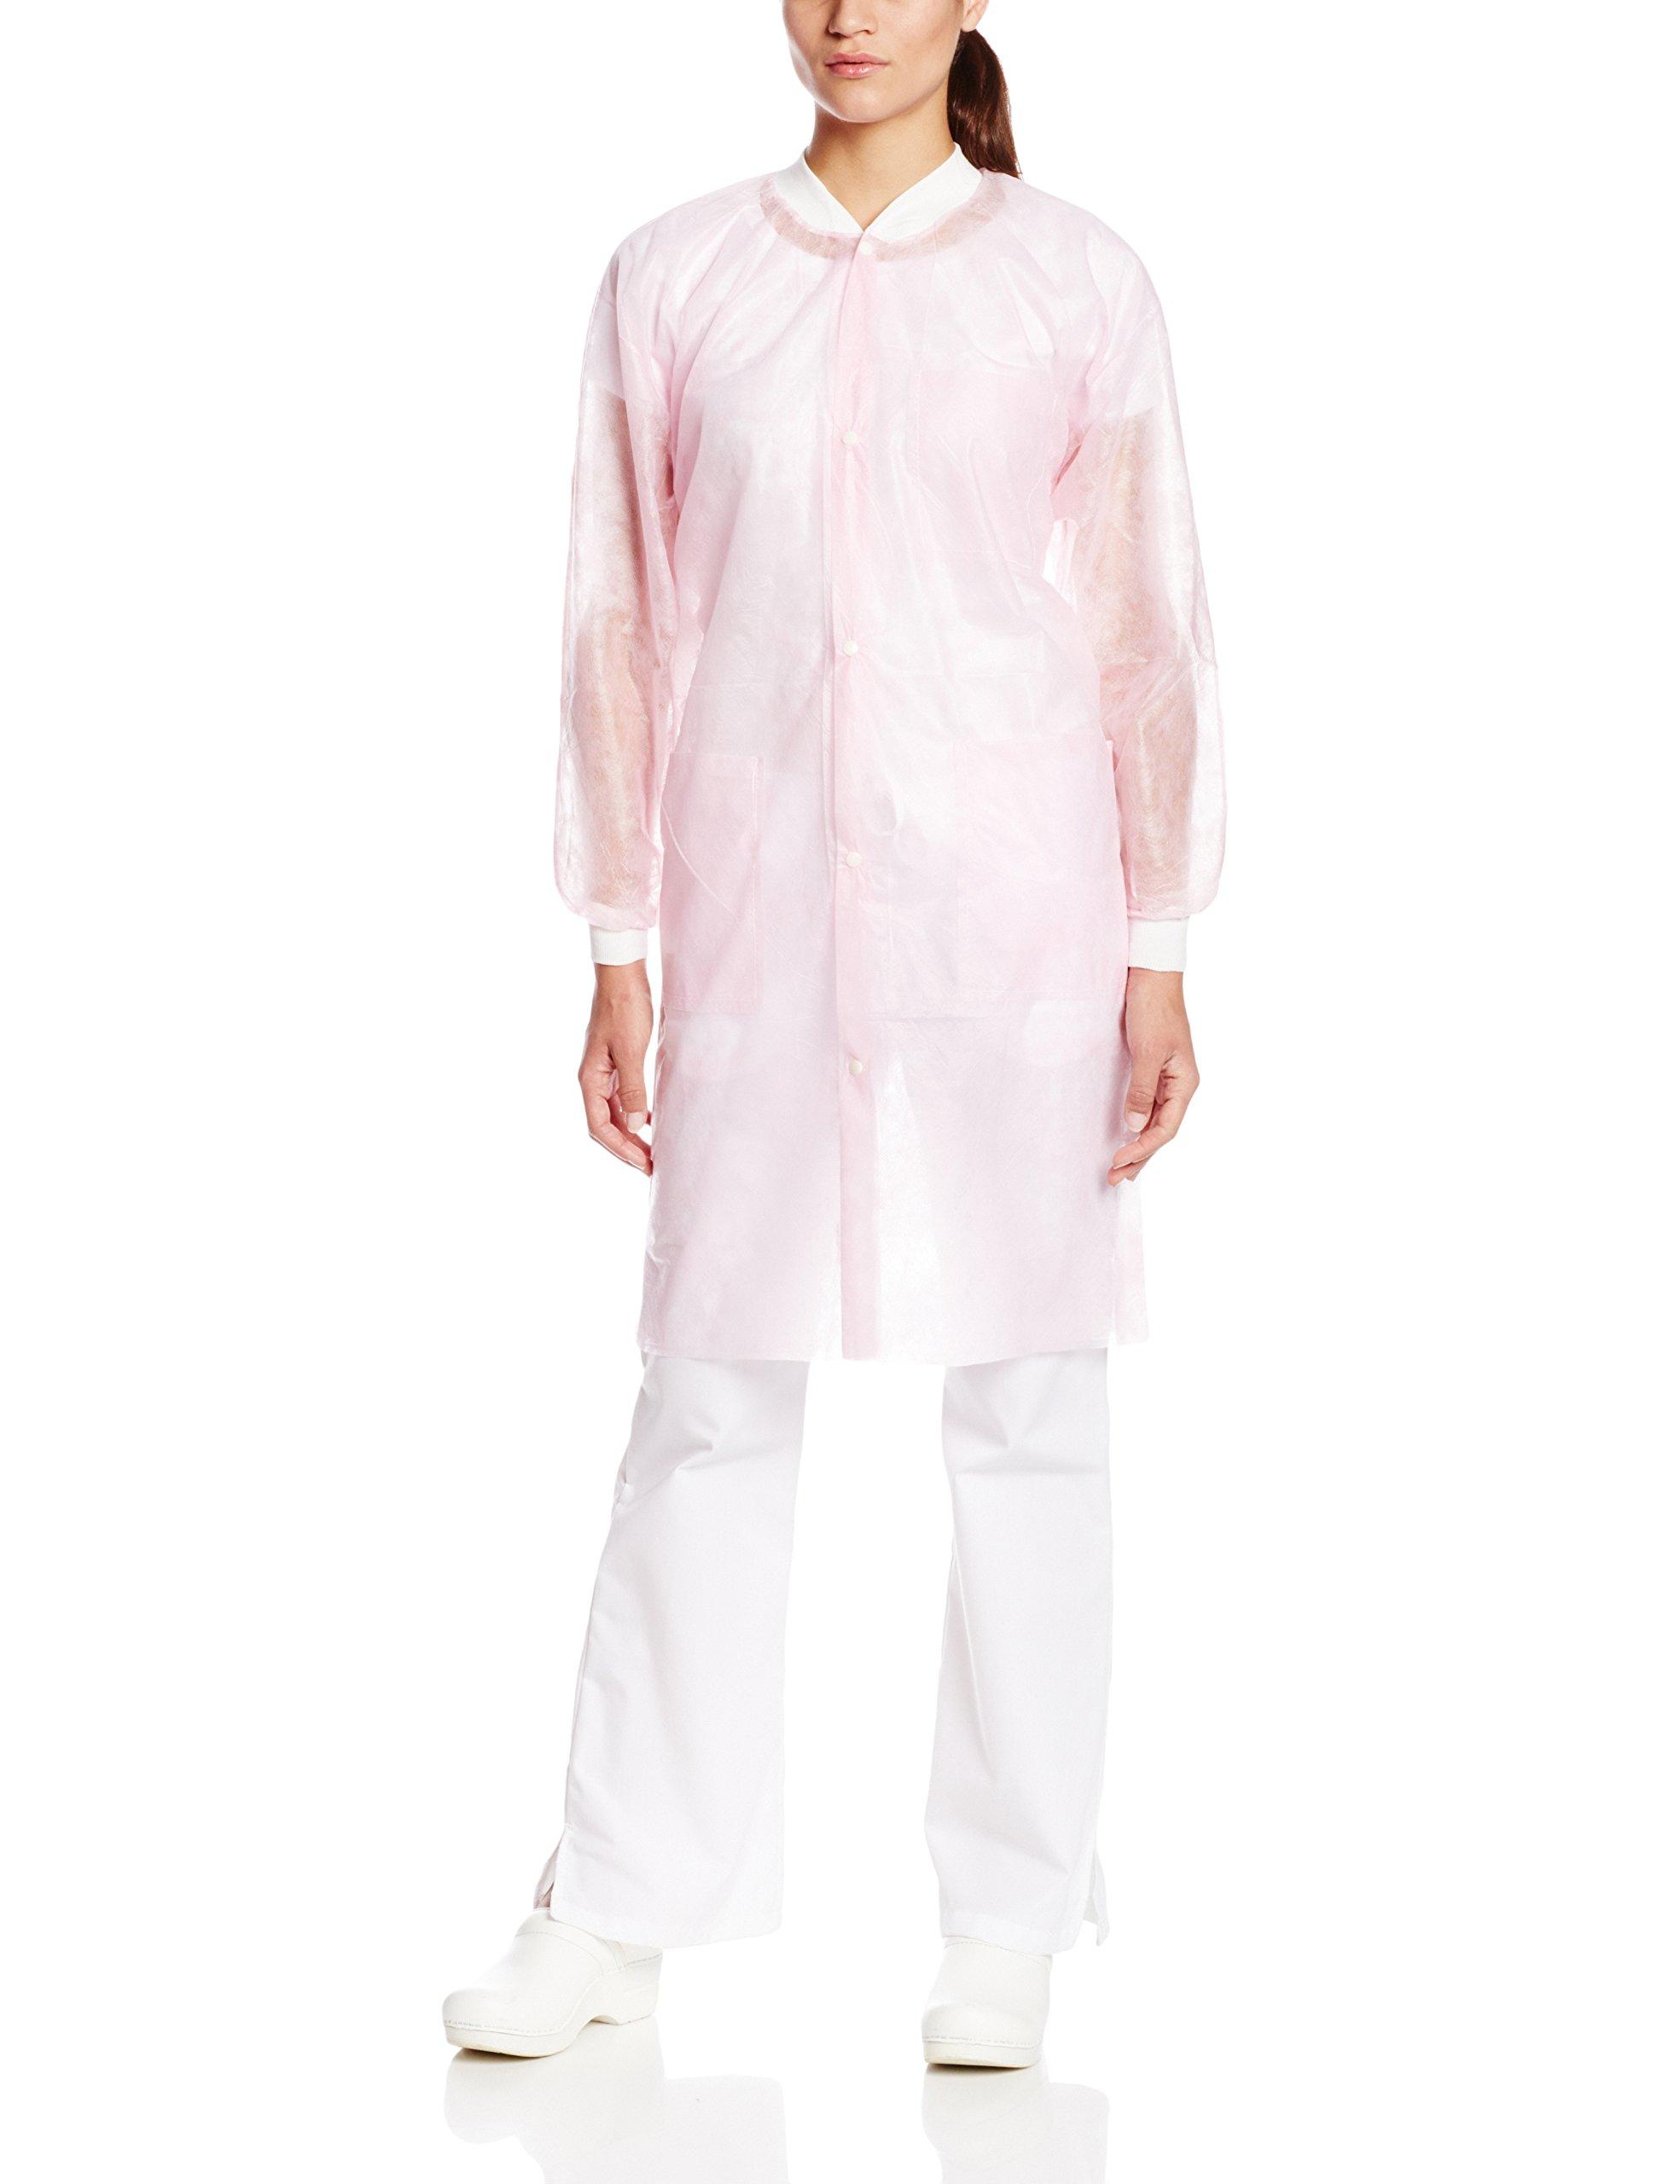 ValuMax 3290LPS Money-Saver, Disposable Isolation Knee Length Lab Coat, Splash Resistant,Light Pink, S, Pack of 10